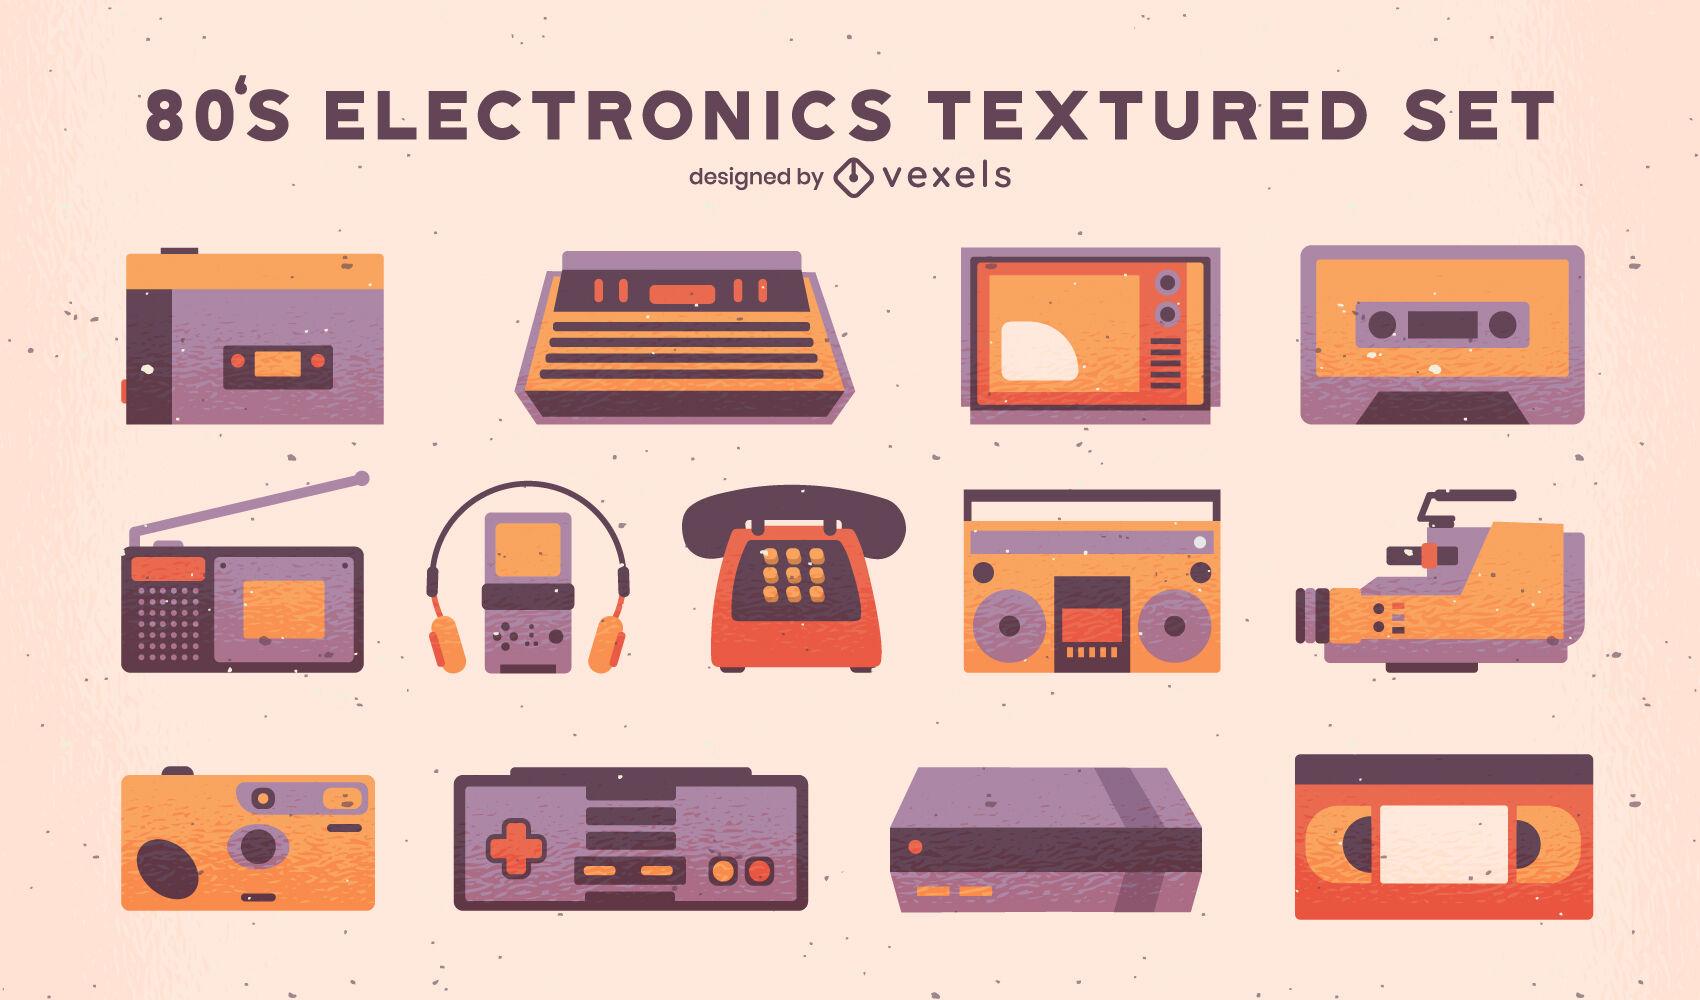 Textured 80s tech retro elements